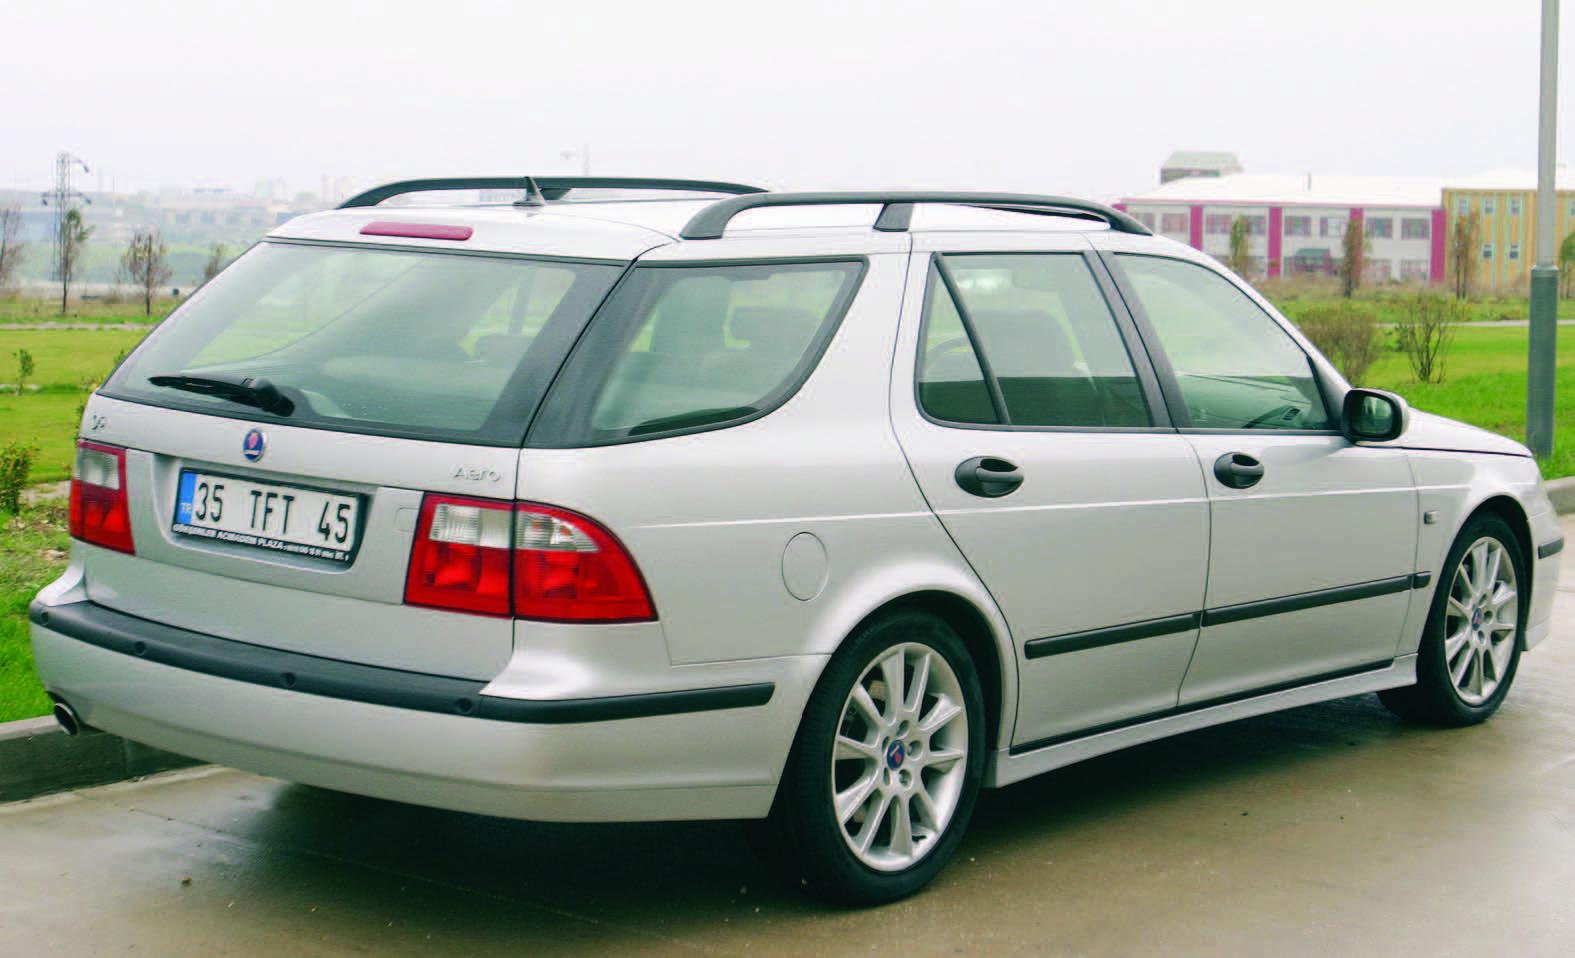 1478788810536 - Saab 9-5 Sport Wagon 2.3 Aero - Test